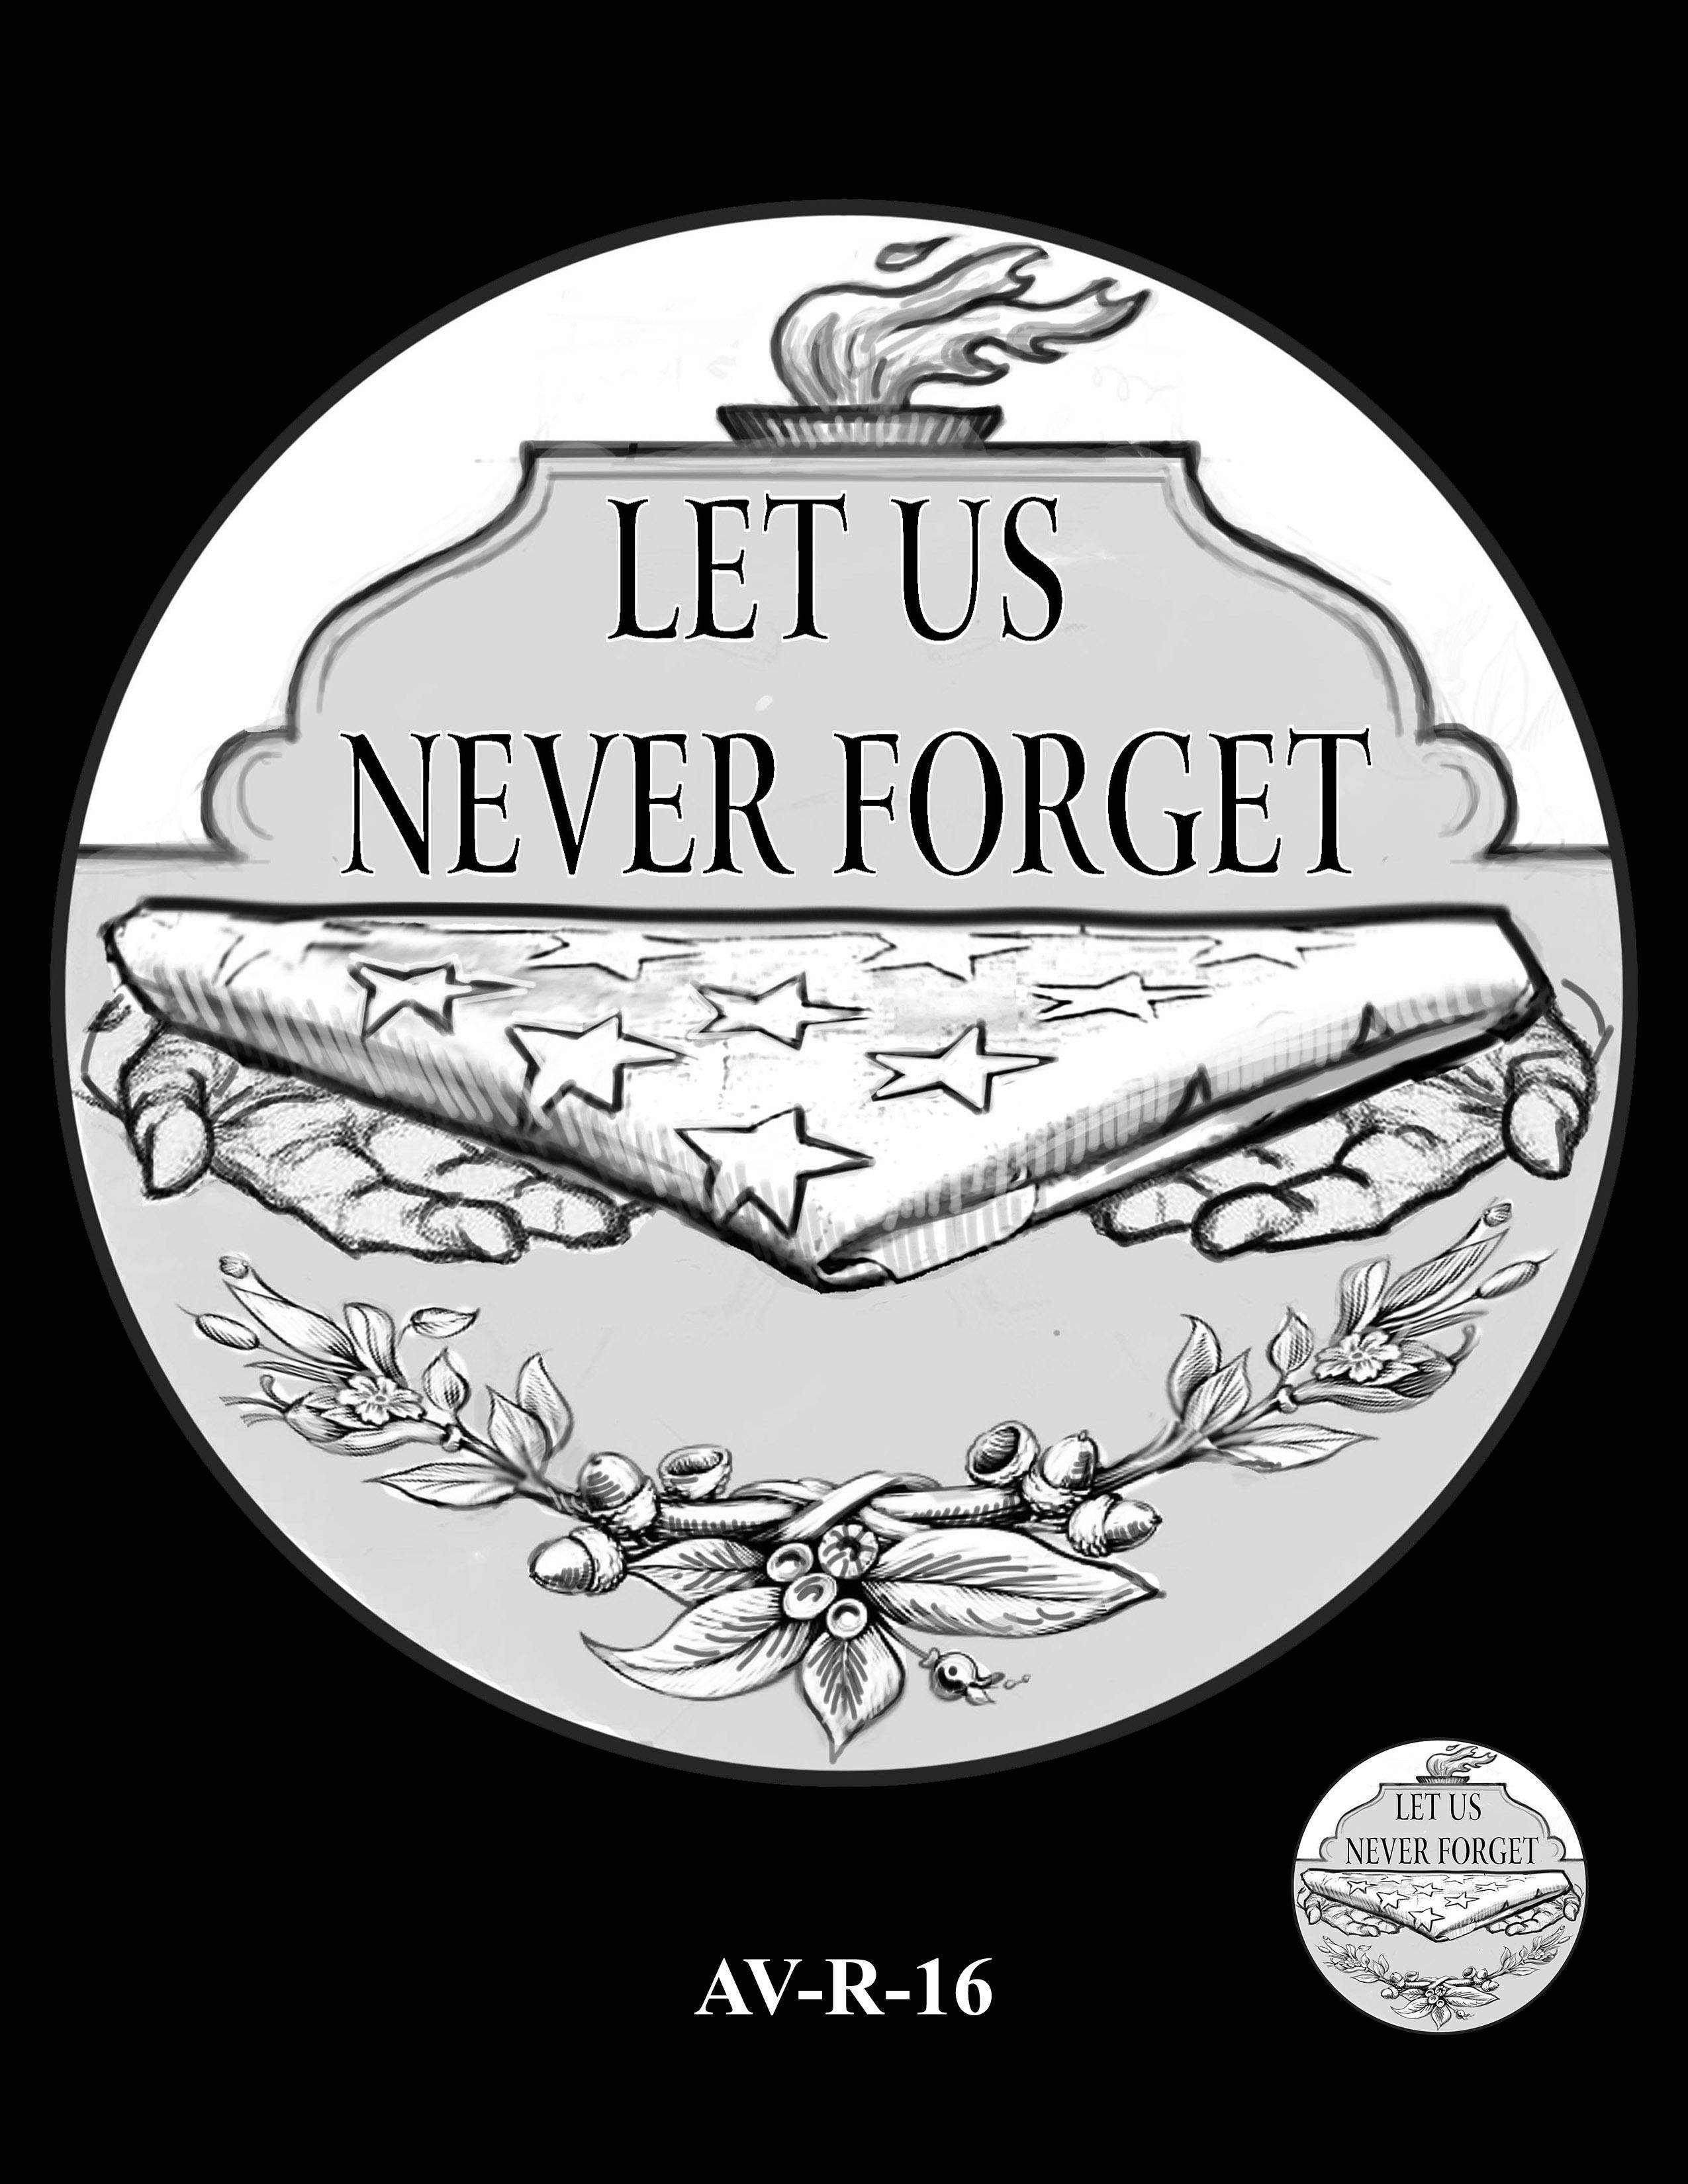 AV-R-16 - American Veterans Medal